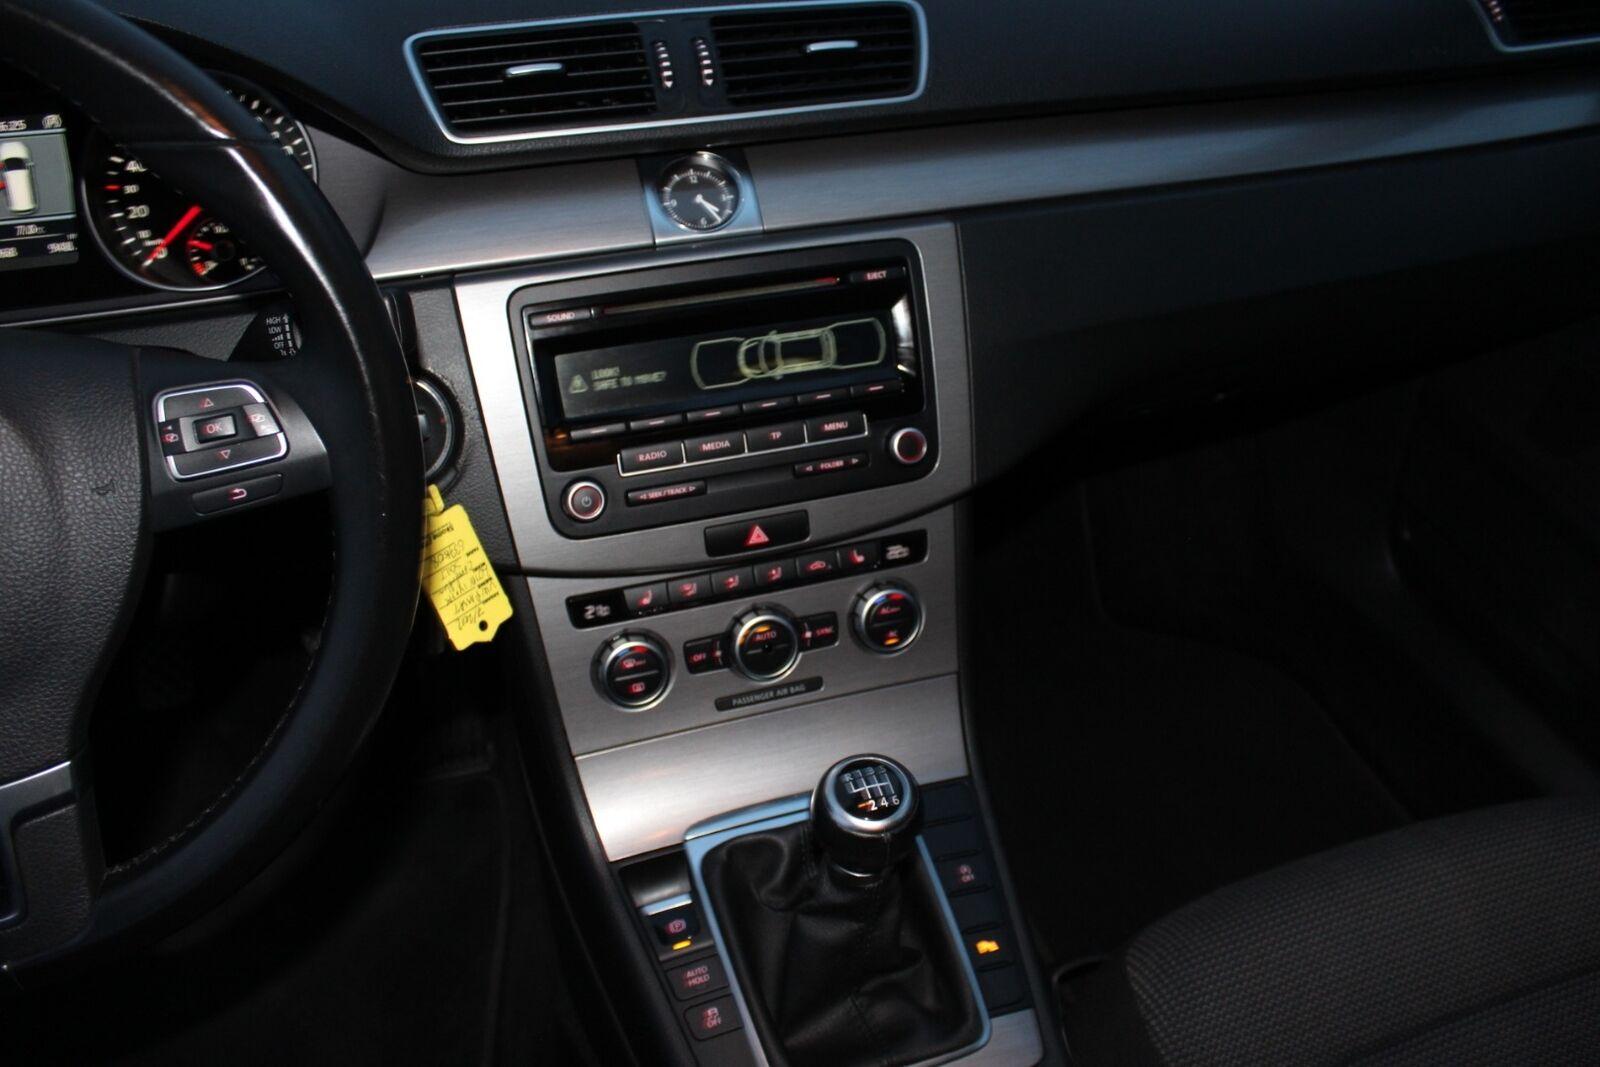 VW Passat 2,0 TDi 140 Comfortl. Vari. BMT - billede 10